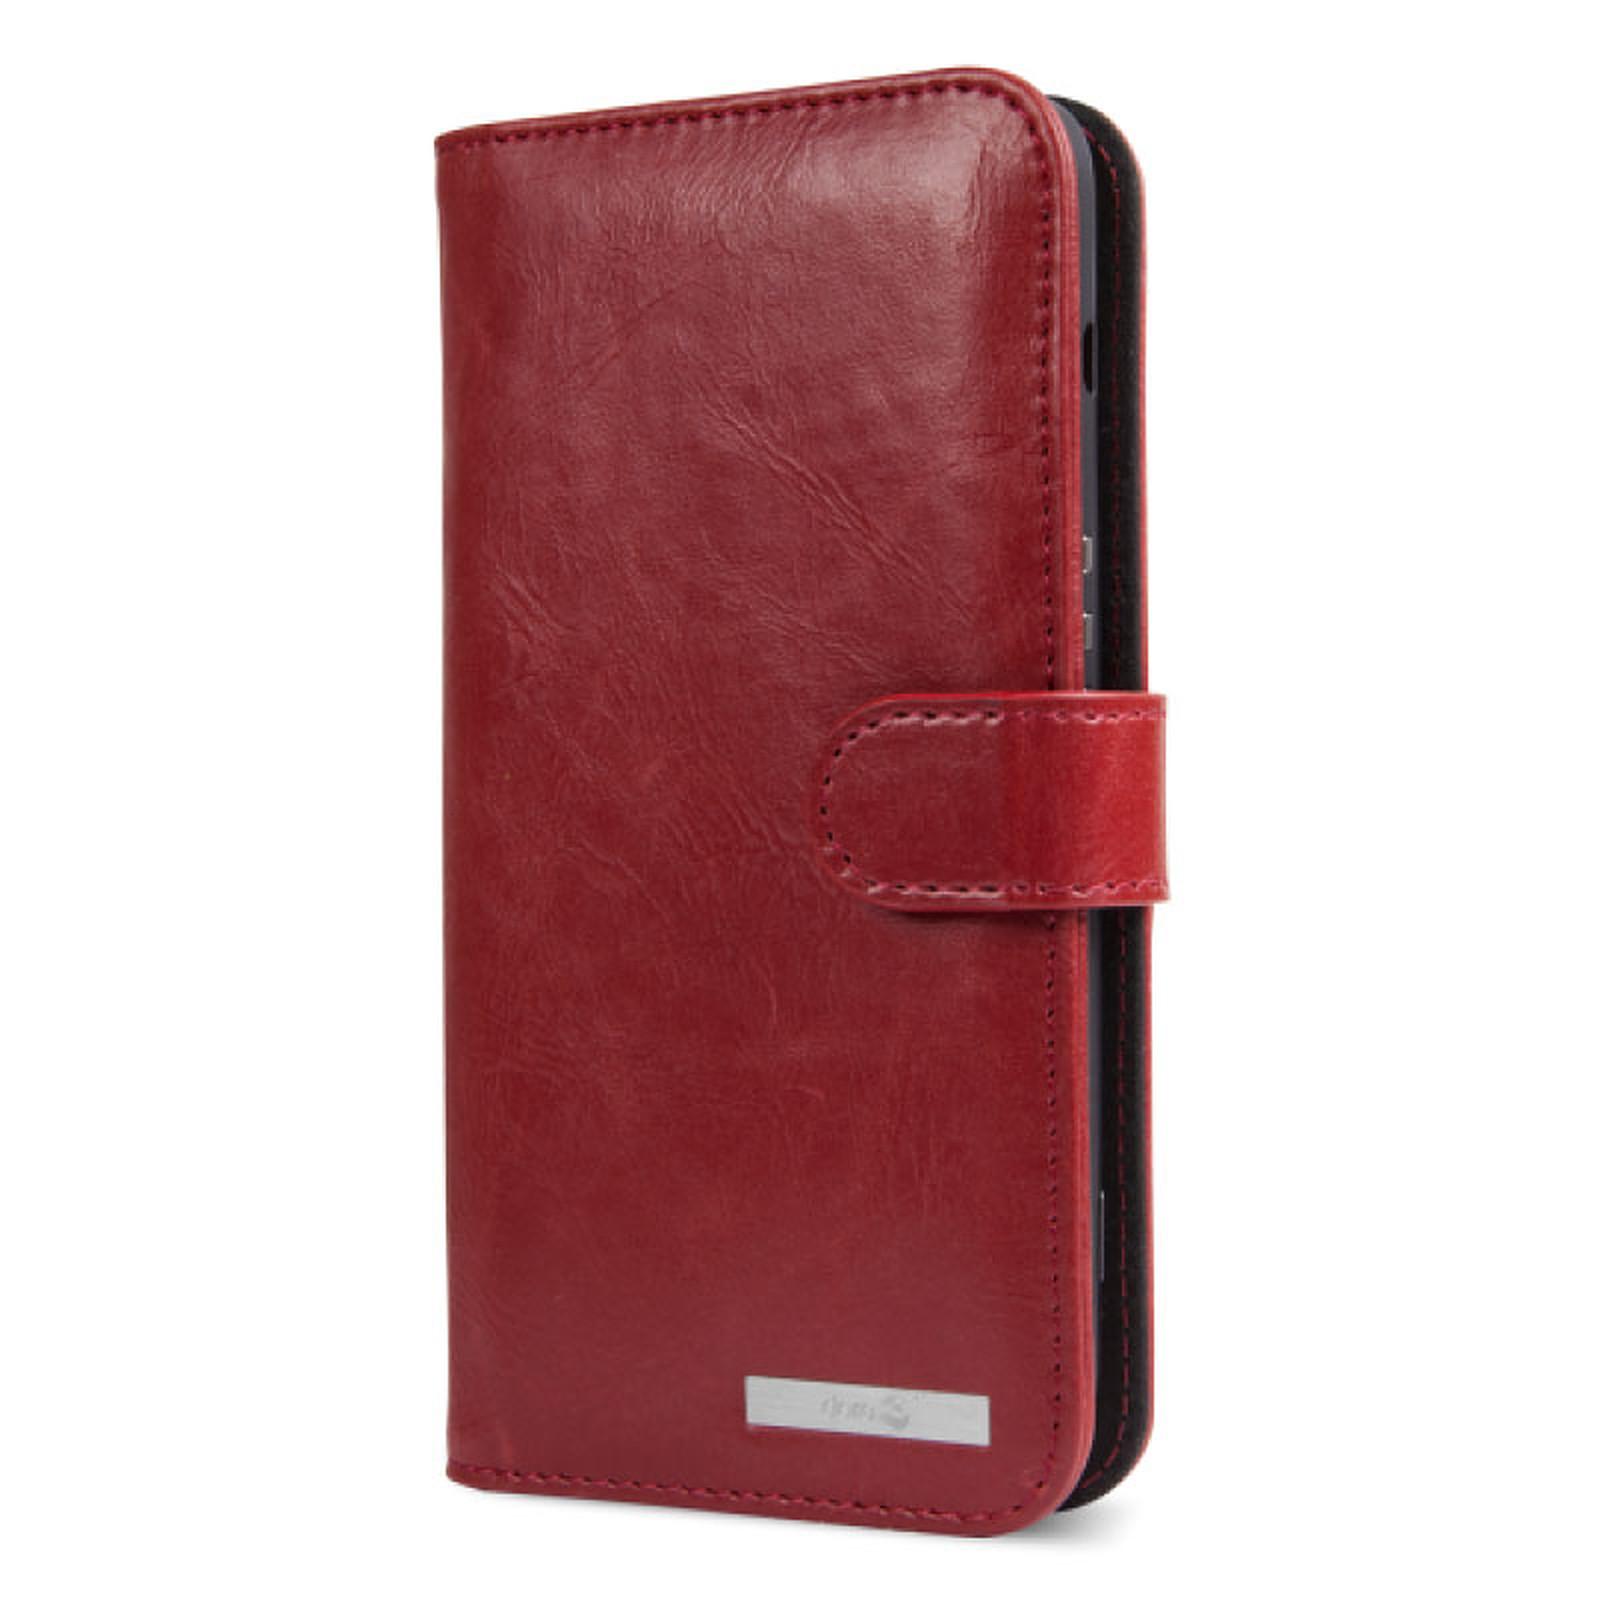 Doro Wallet Case Rouge 8040